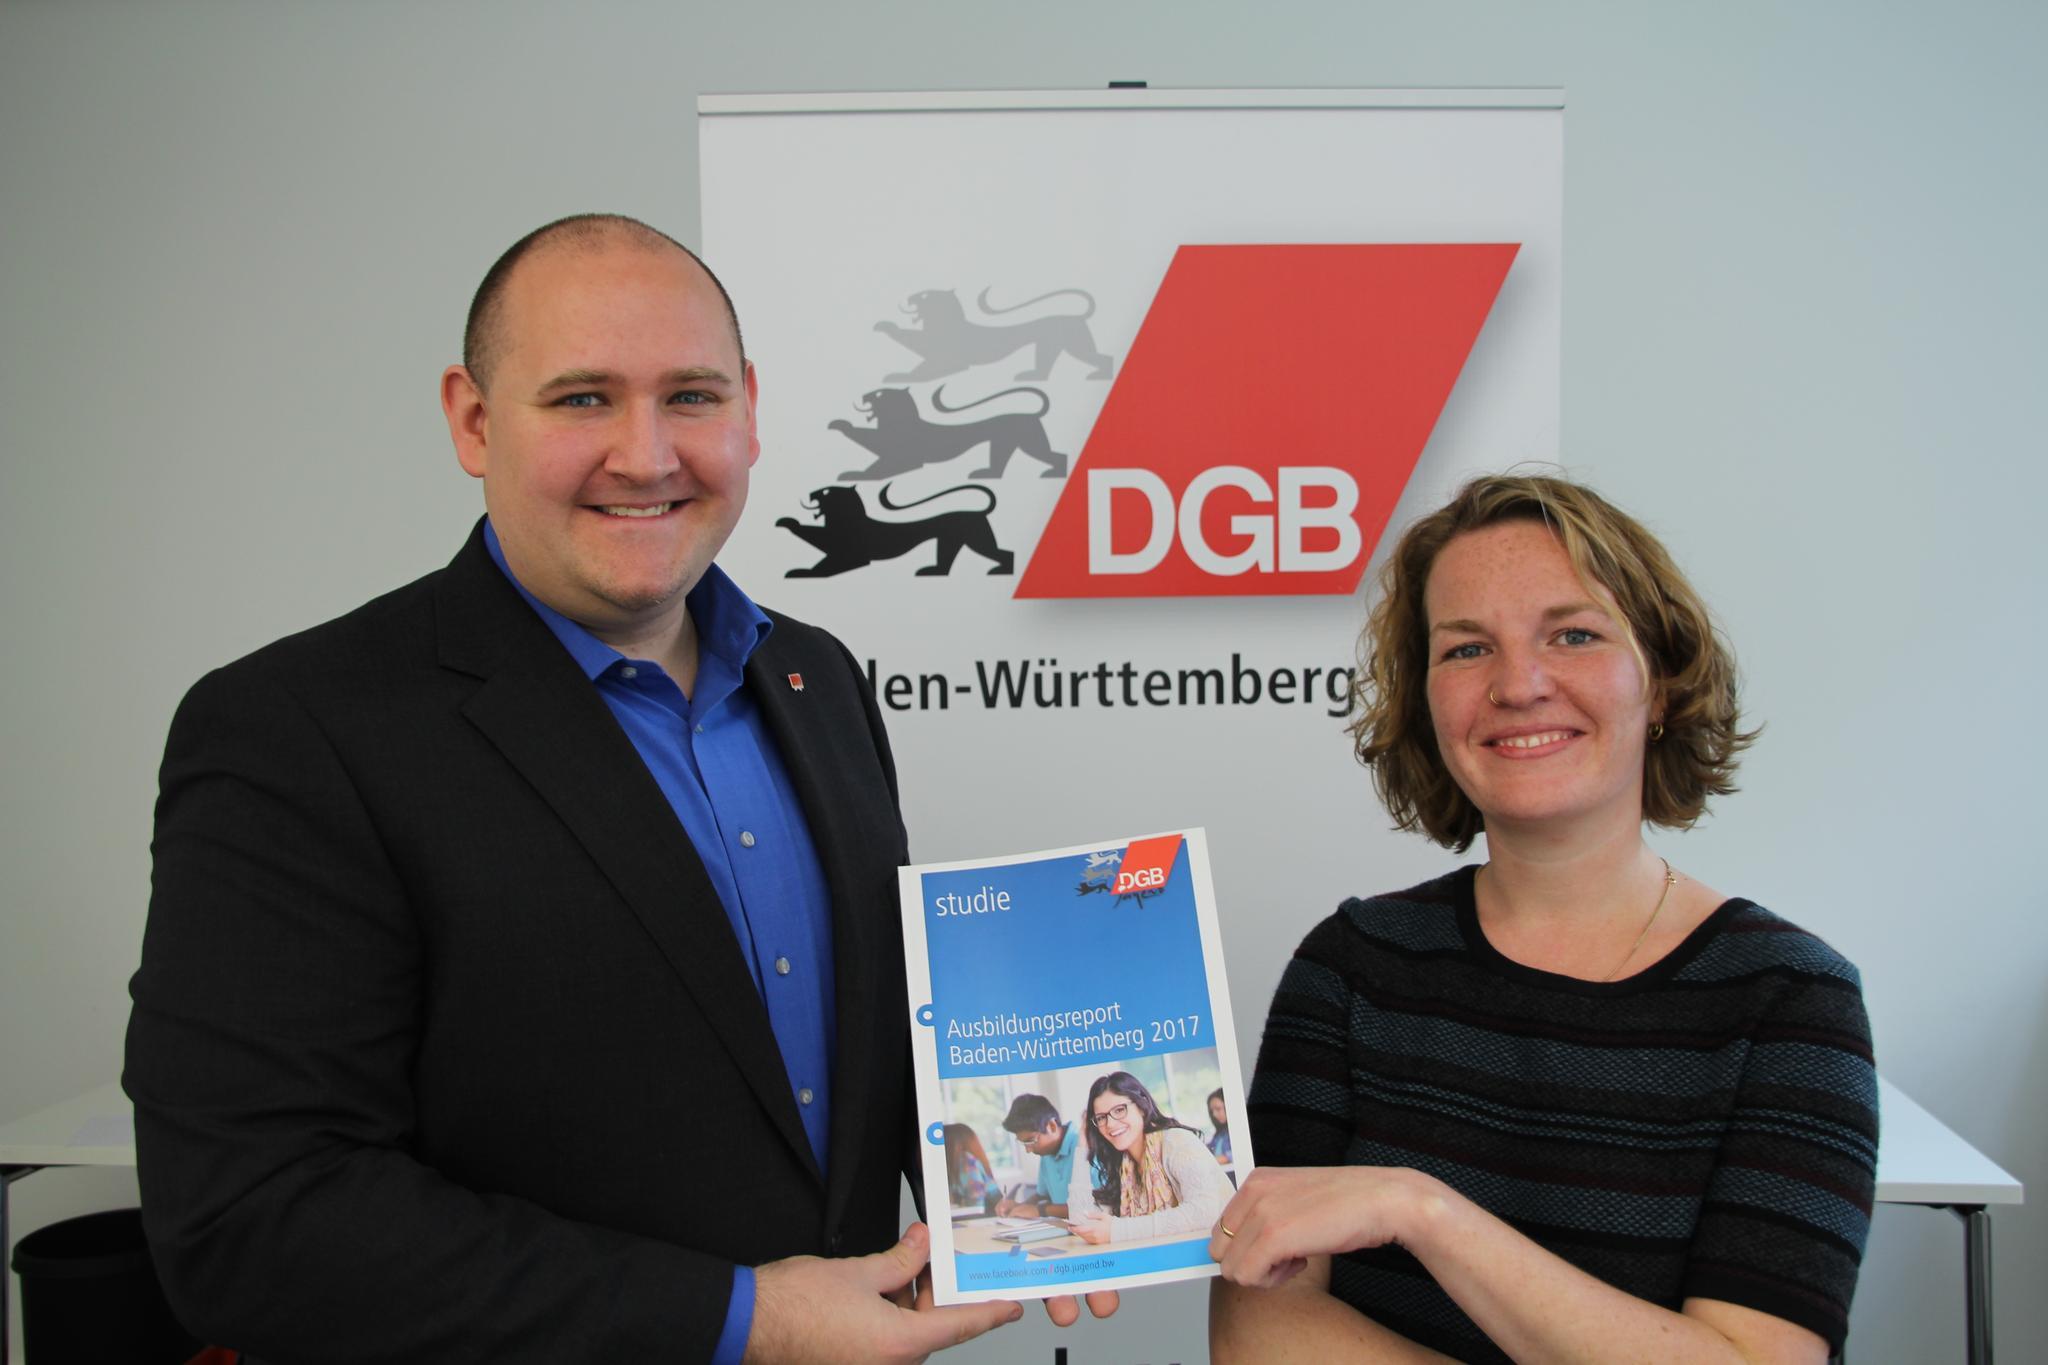 Ausbildungsreport Baden-Württemberg 2017